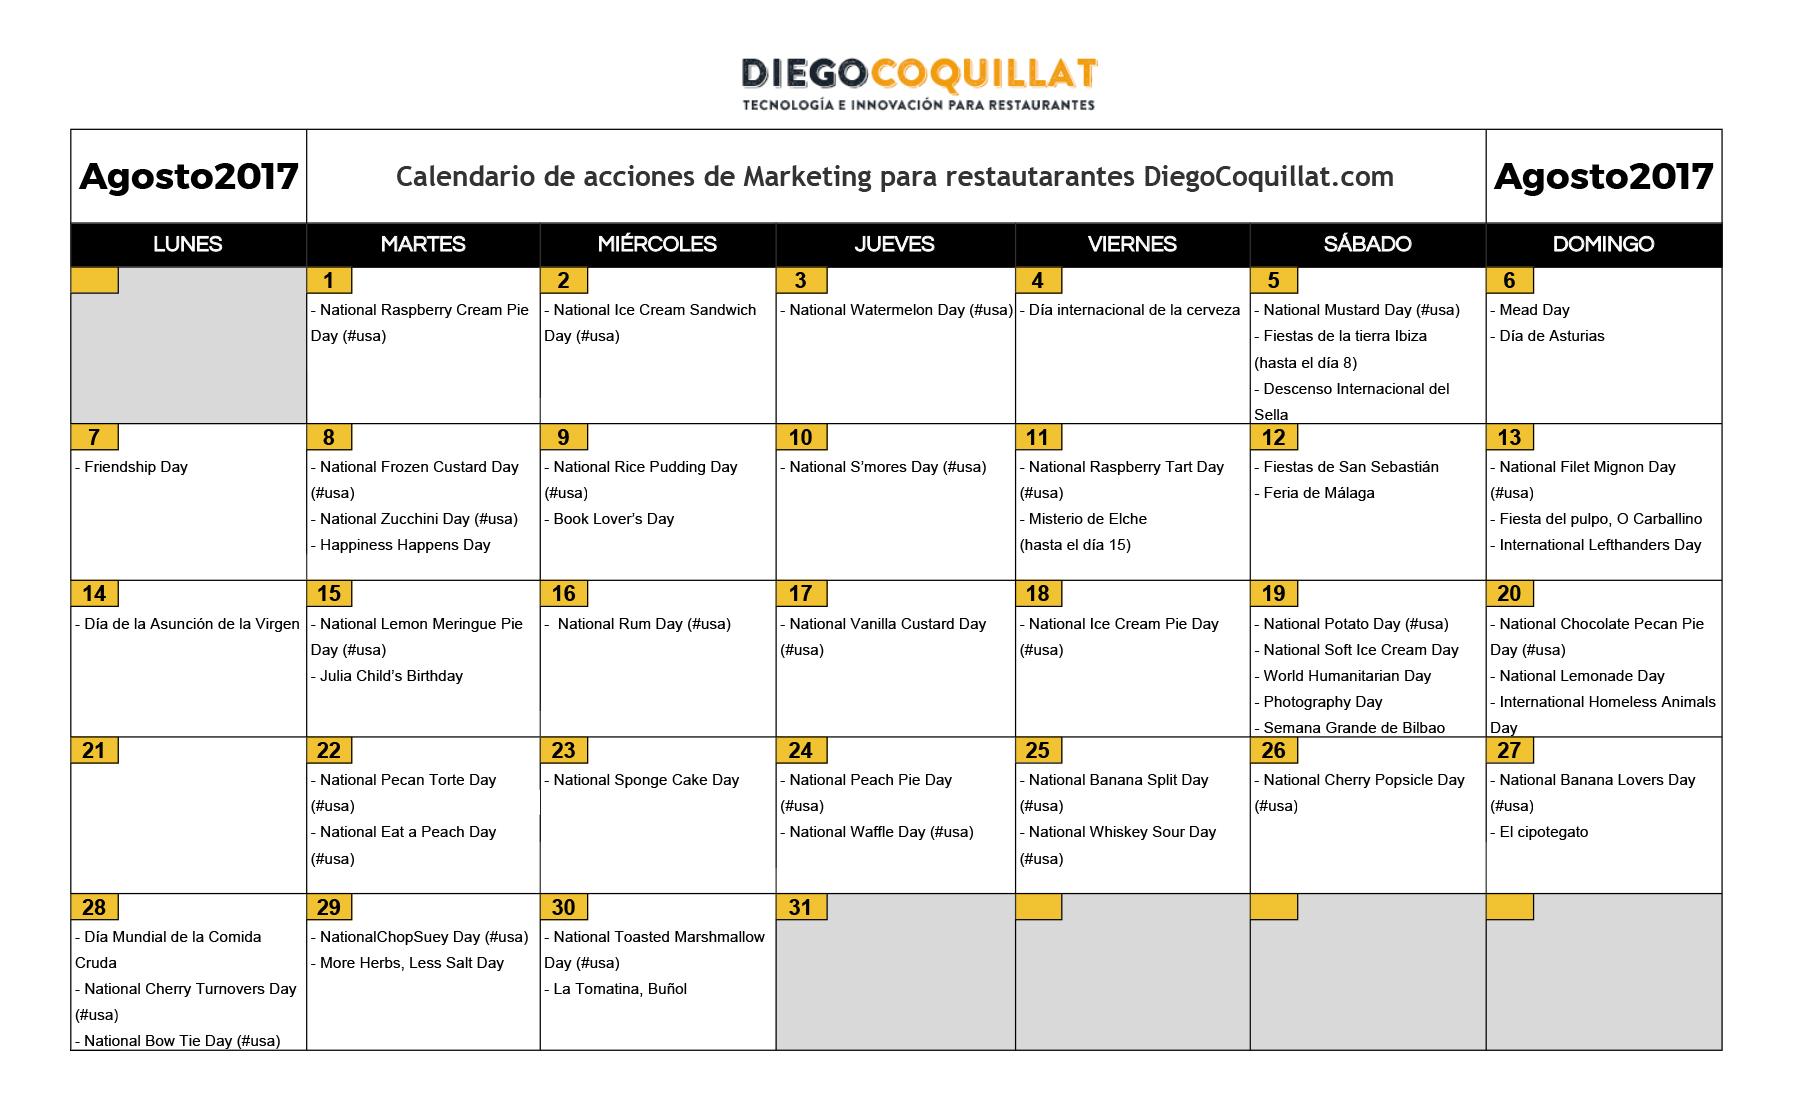 August 2017: marketing activities calendar for restaurants